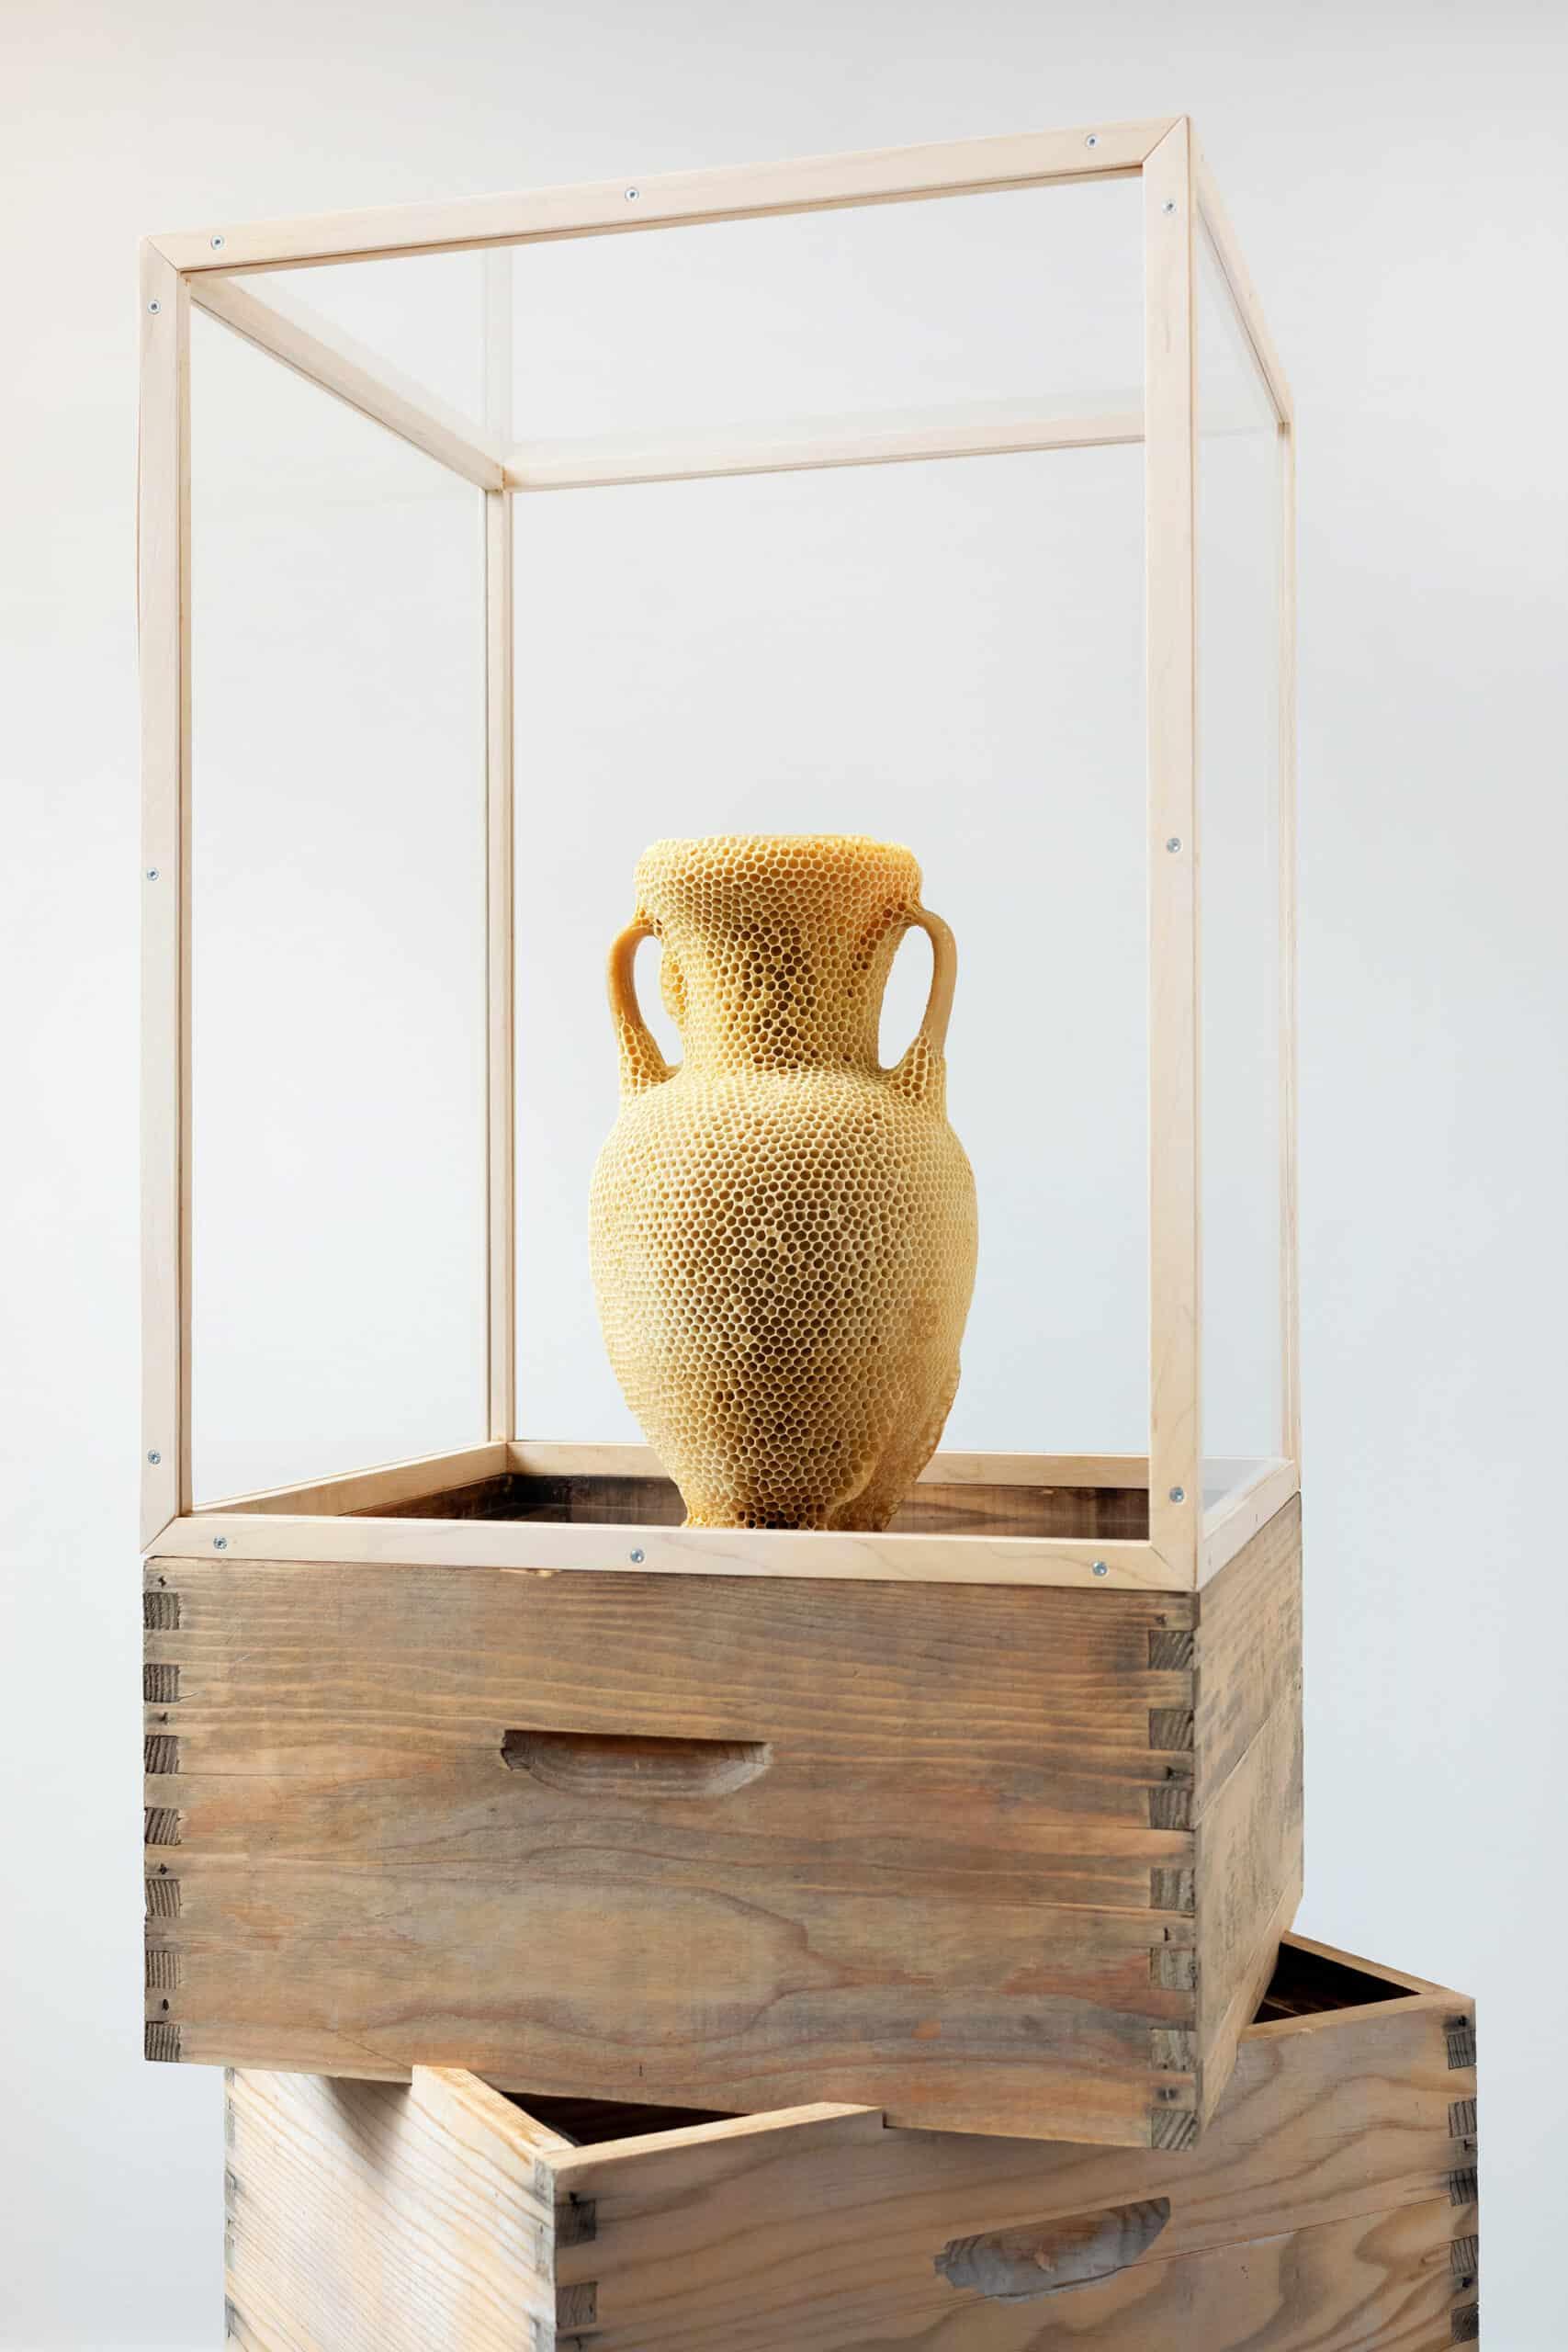 The Honeycomb Amphora tomas libertini exhibida